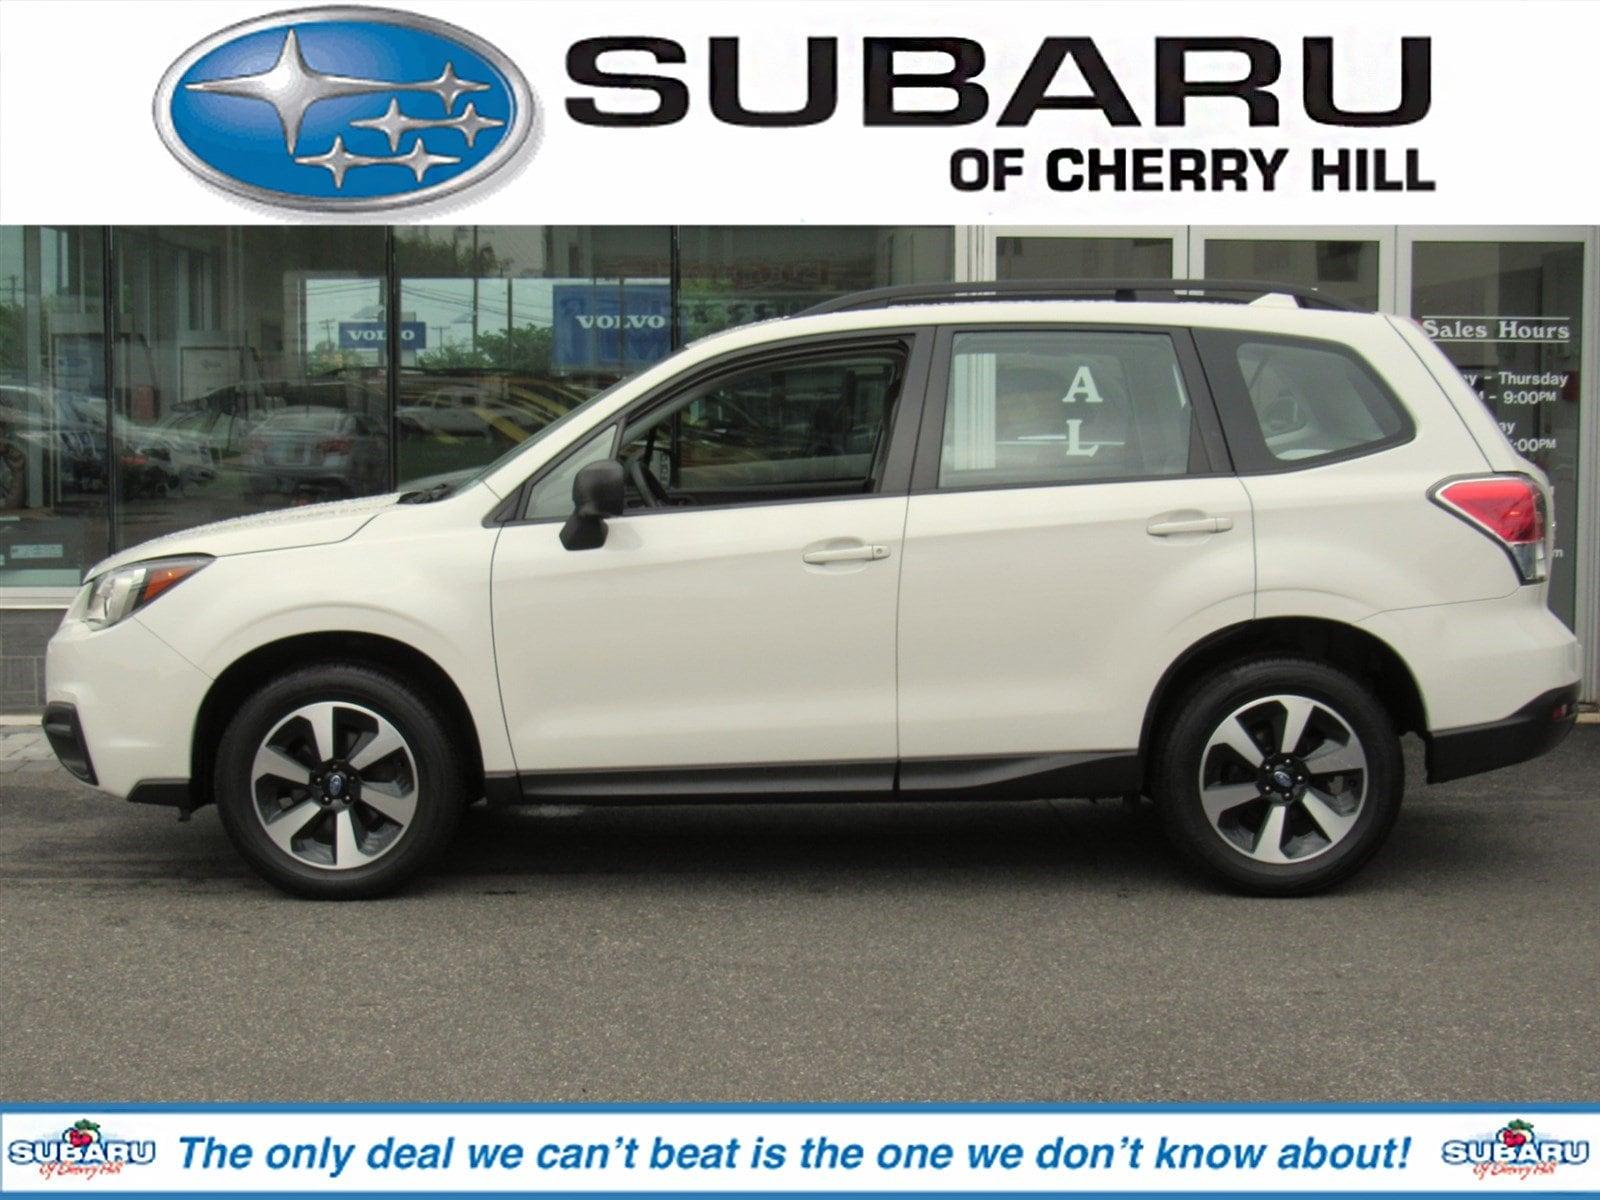 Certified Used 2017 Subaru Forester For Sale | Cherry Hill NJ |  JF2SJABC4HH471974 | Near Philadelphia, Haddonfield, Collingswood